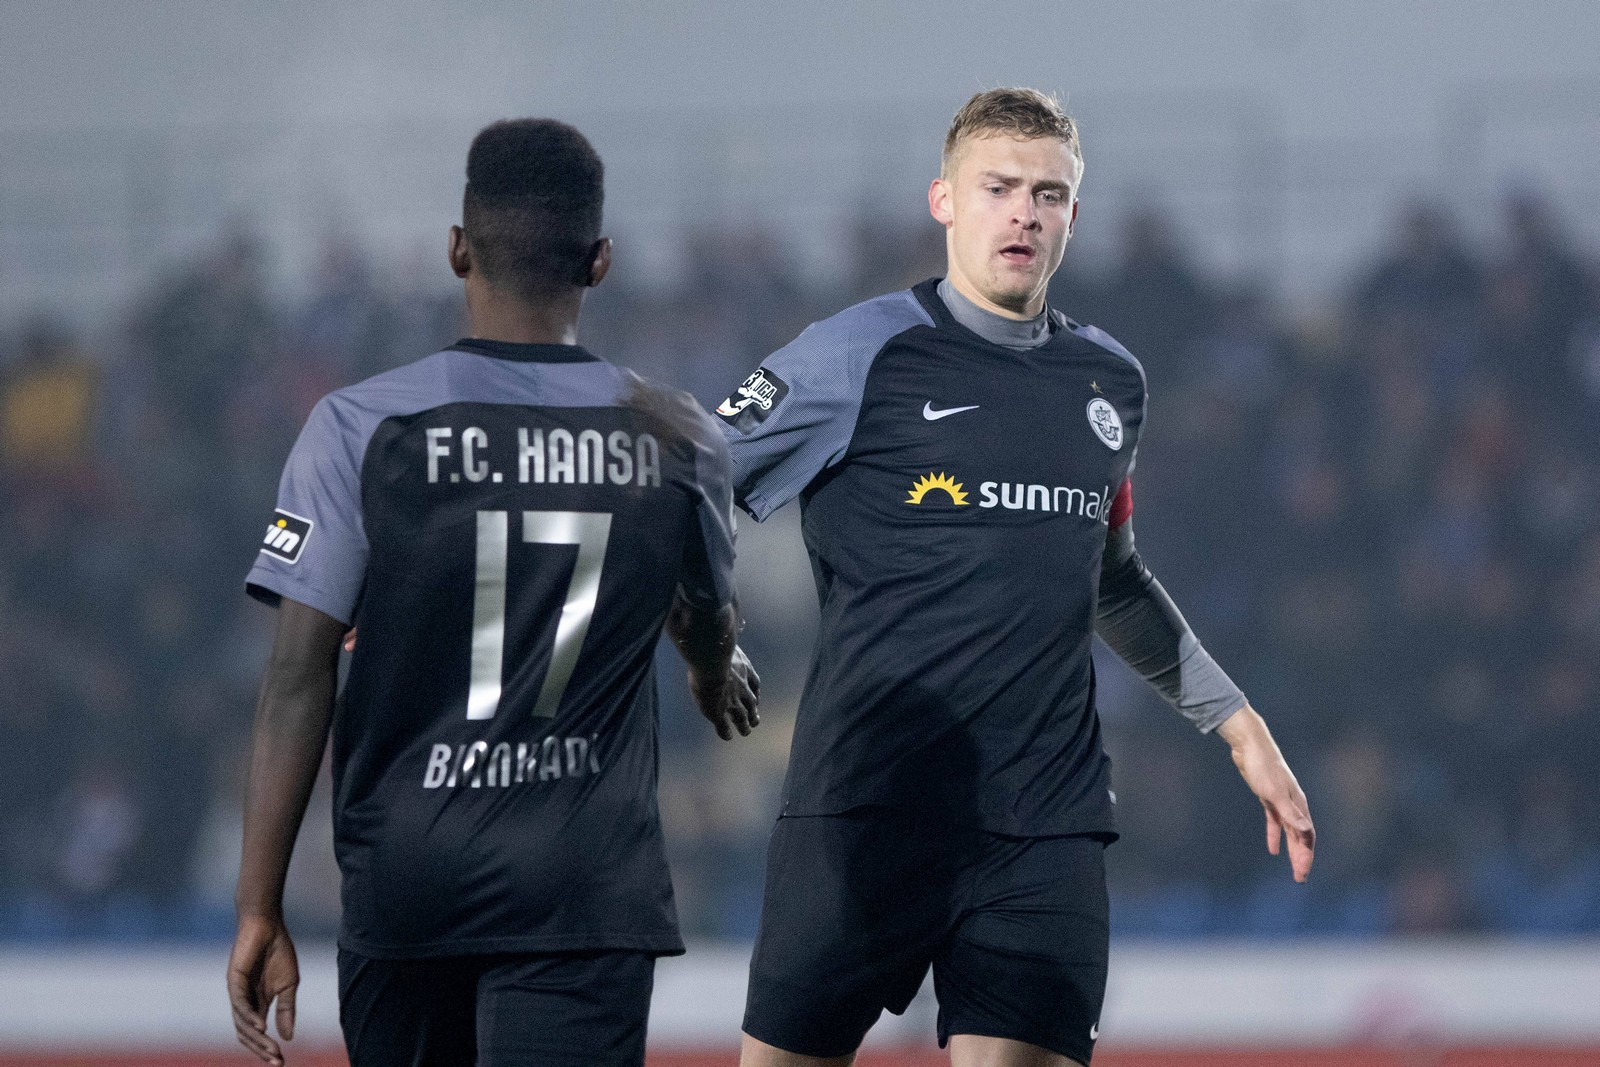 Kapitän Oliver Hüsing rettete Rostock einen Punkt gegen den VfL Osnabrück.